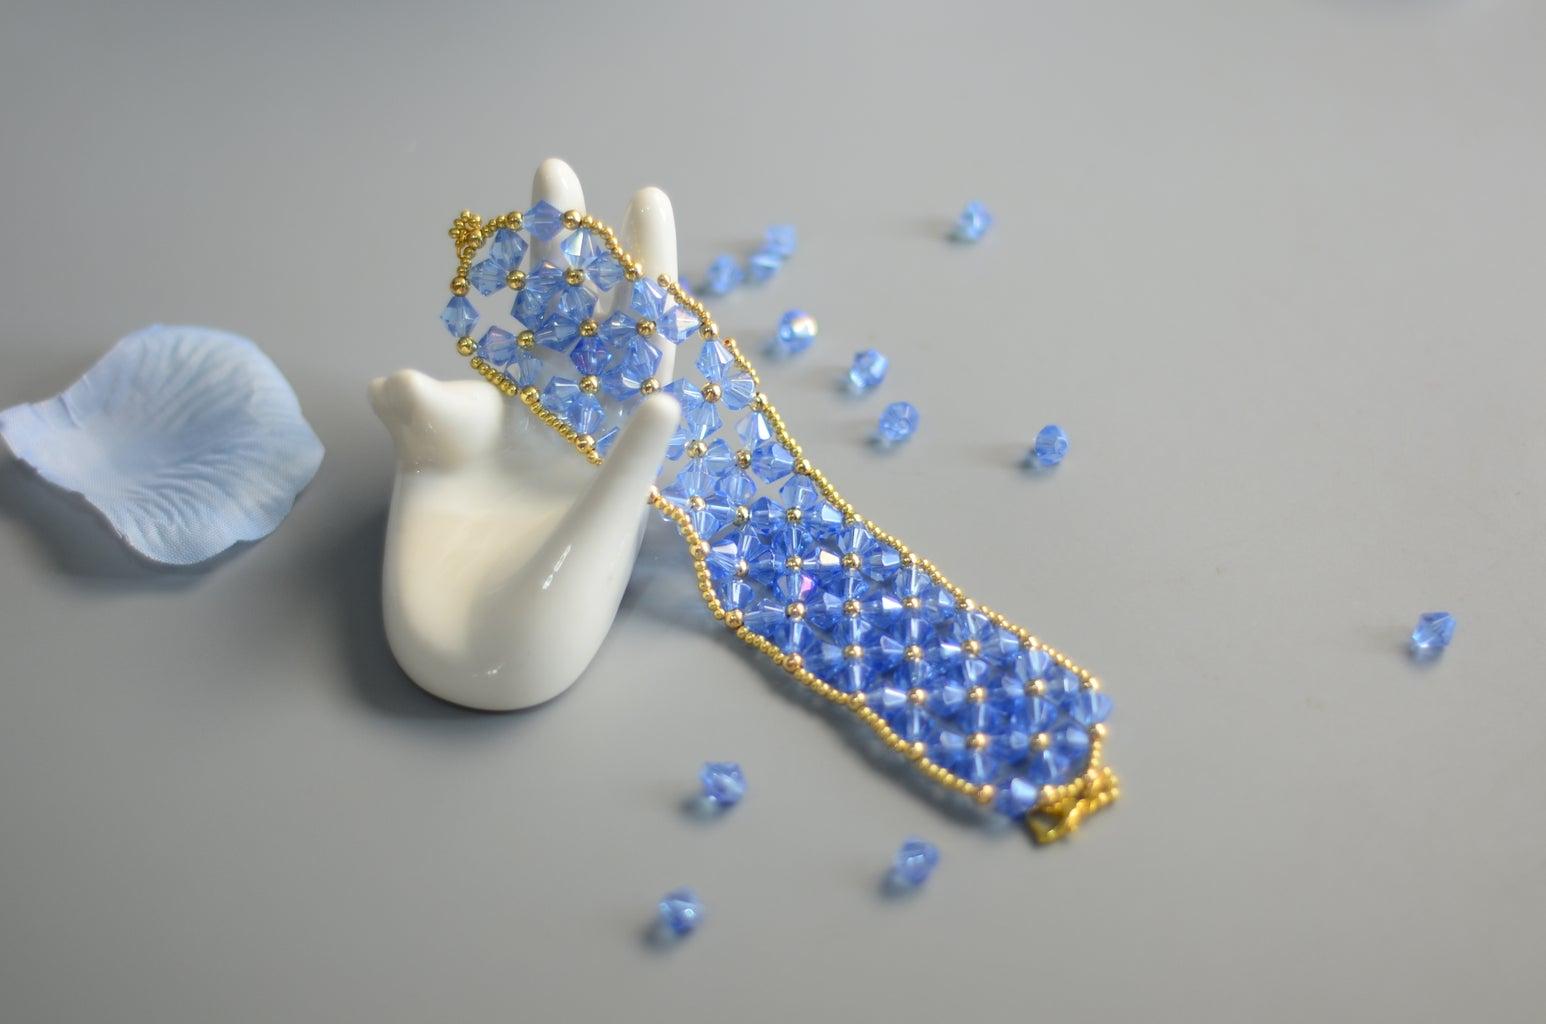 Beebeecraft Tutorials on How to Make Crystal Wide Bracelet